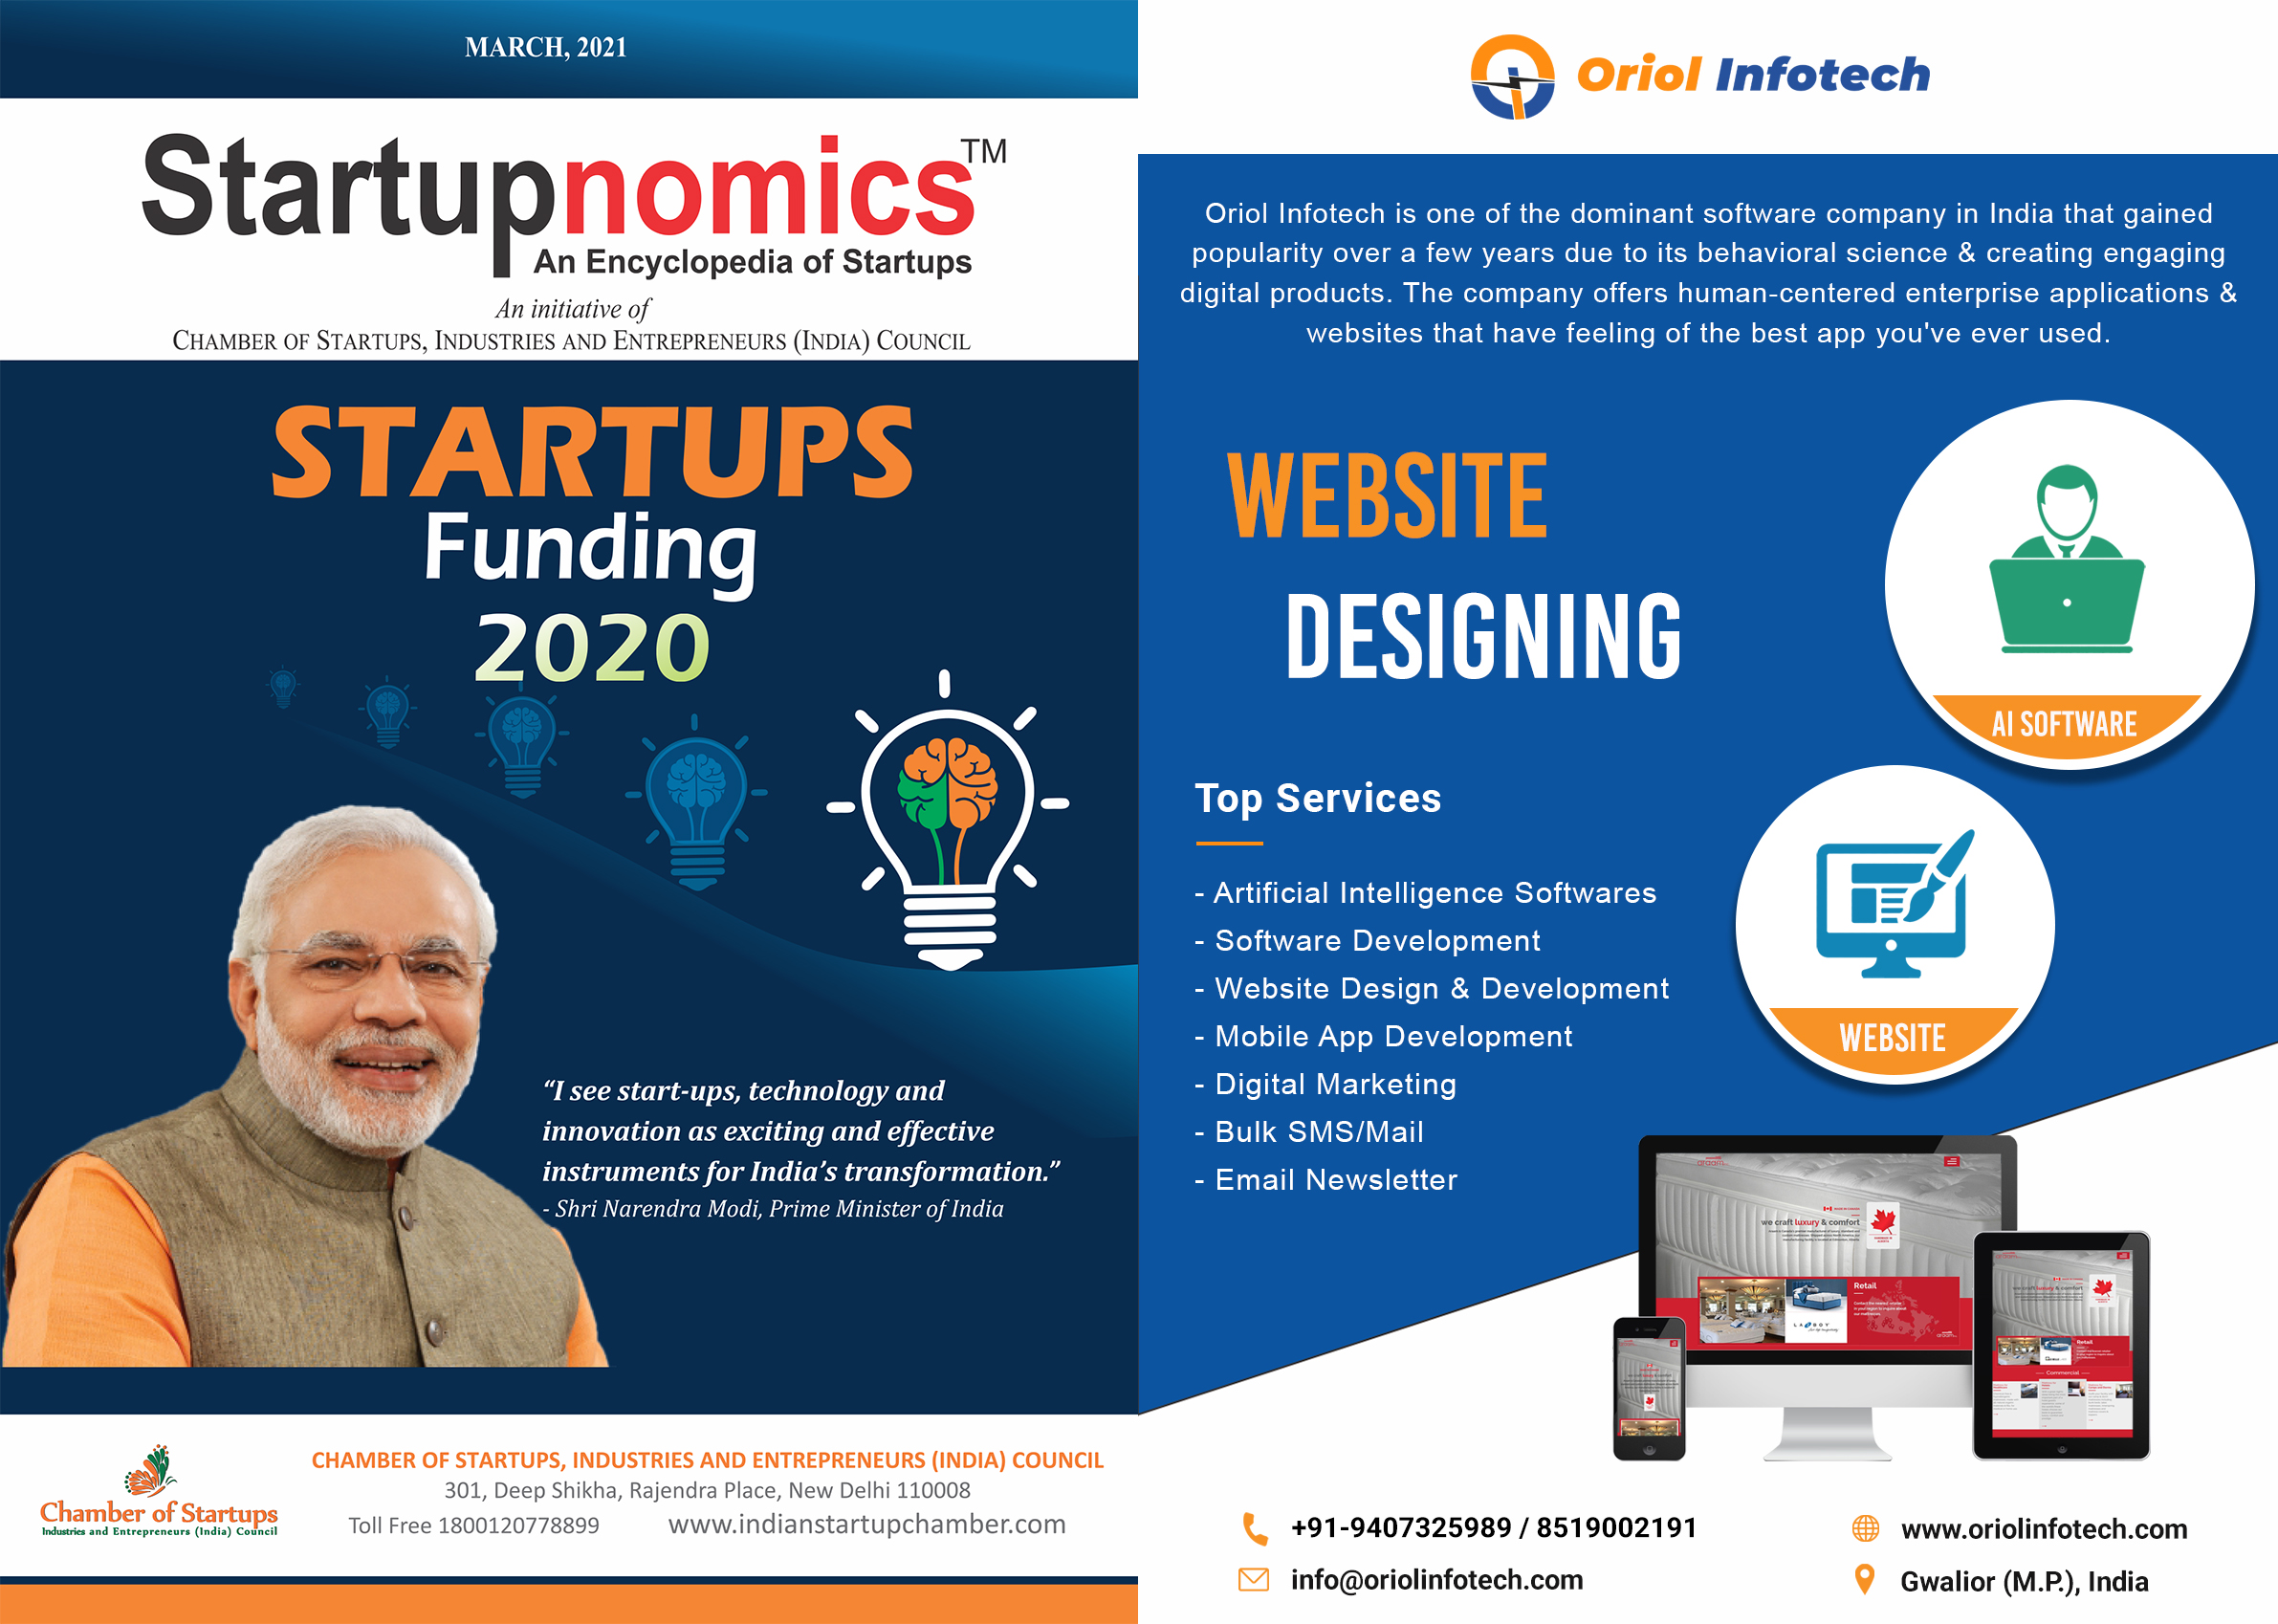 Startup Nomics